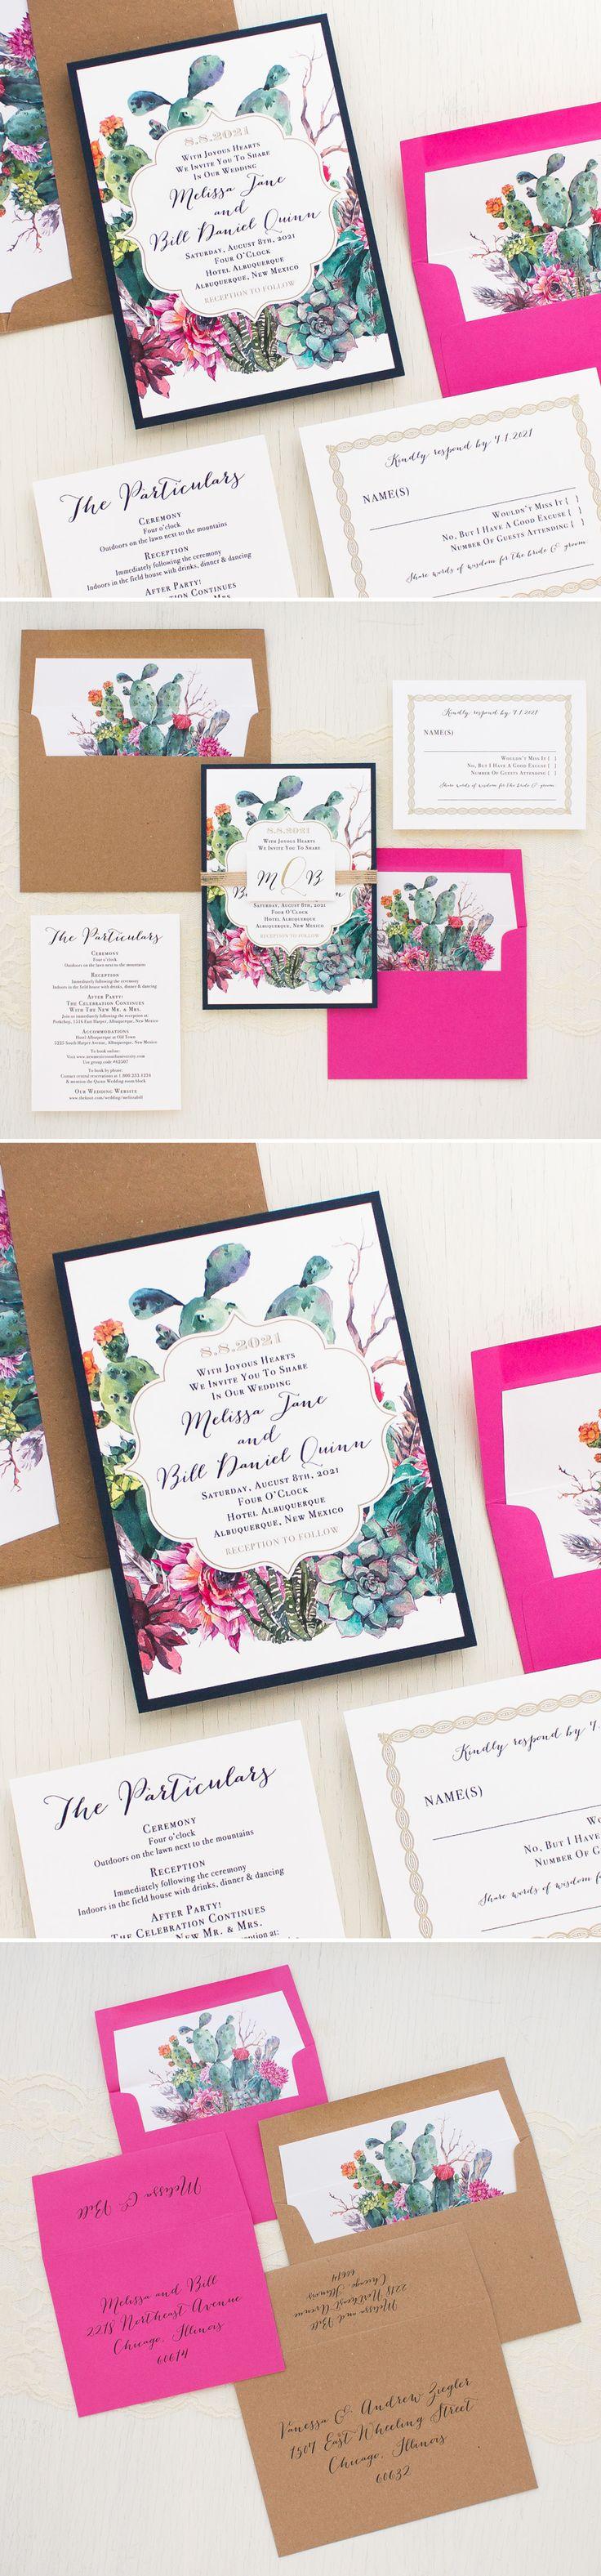 85 Best Wedding Invitations Images On Pinterest Weddings Wedding